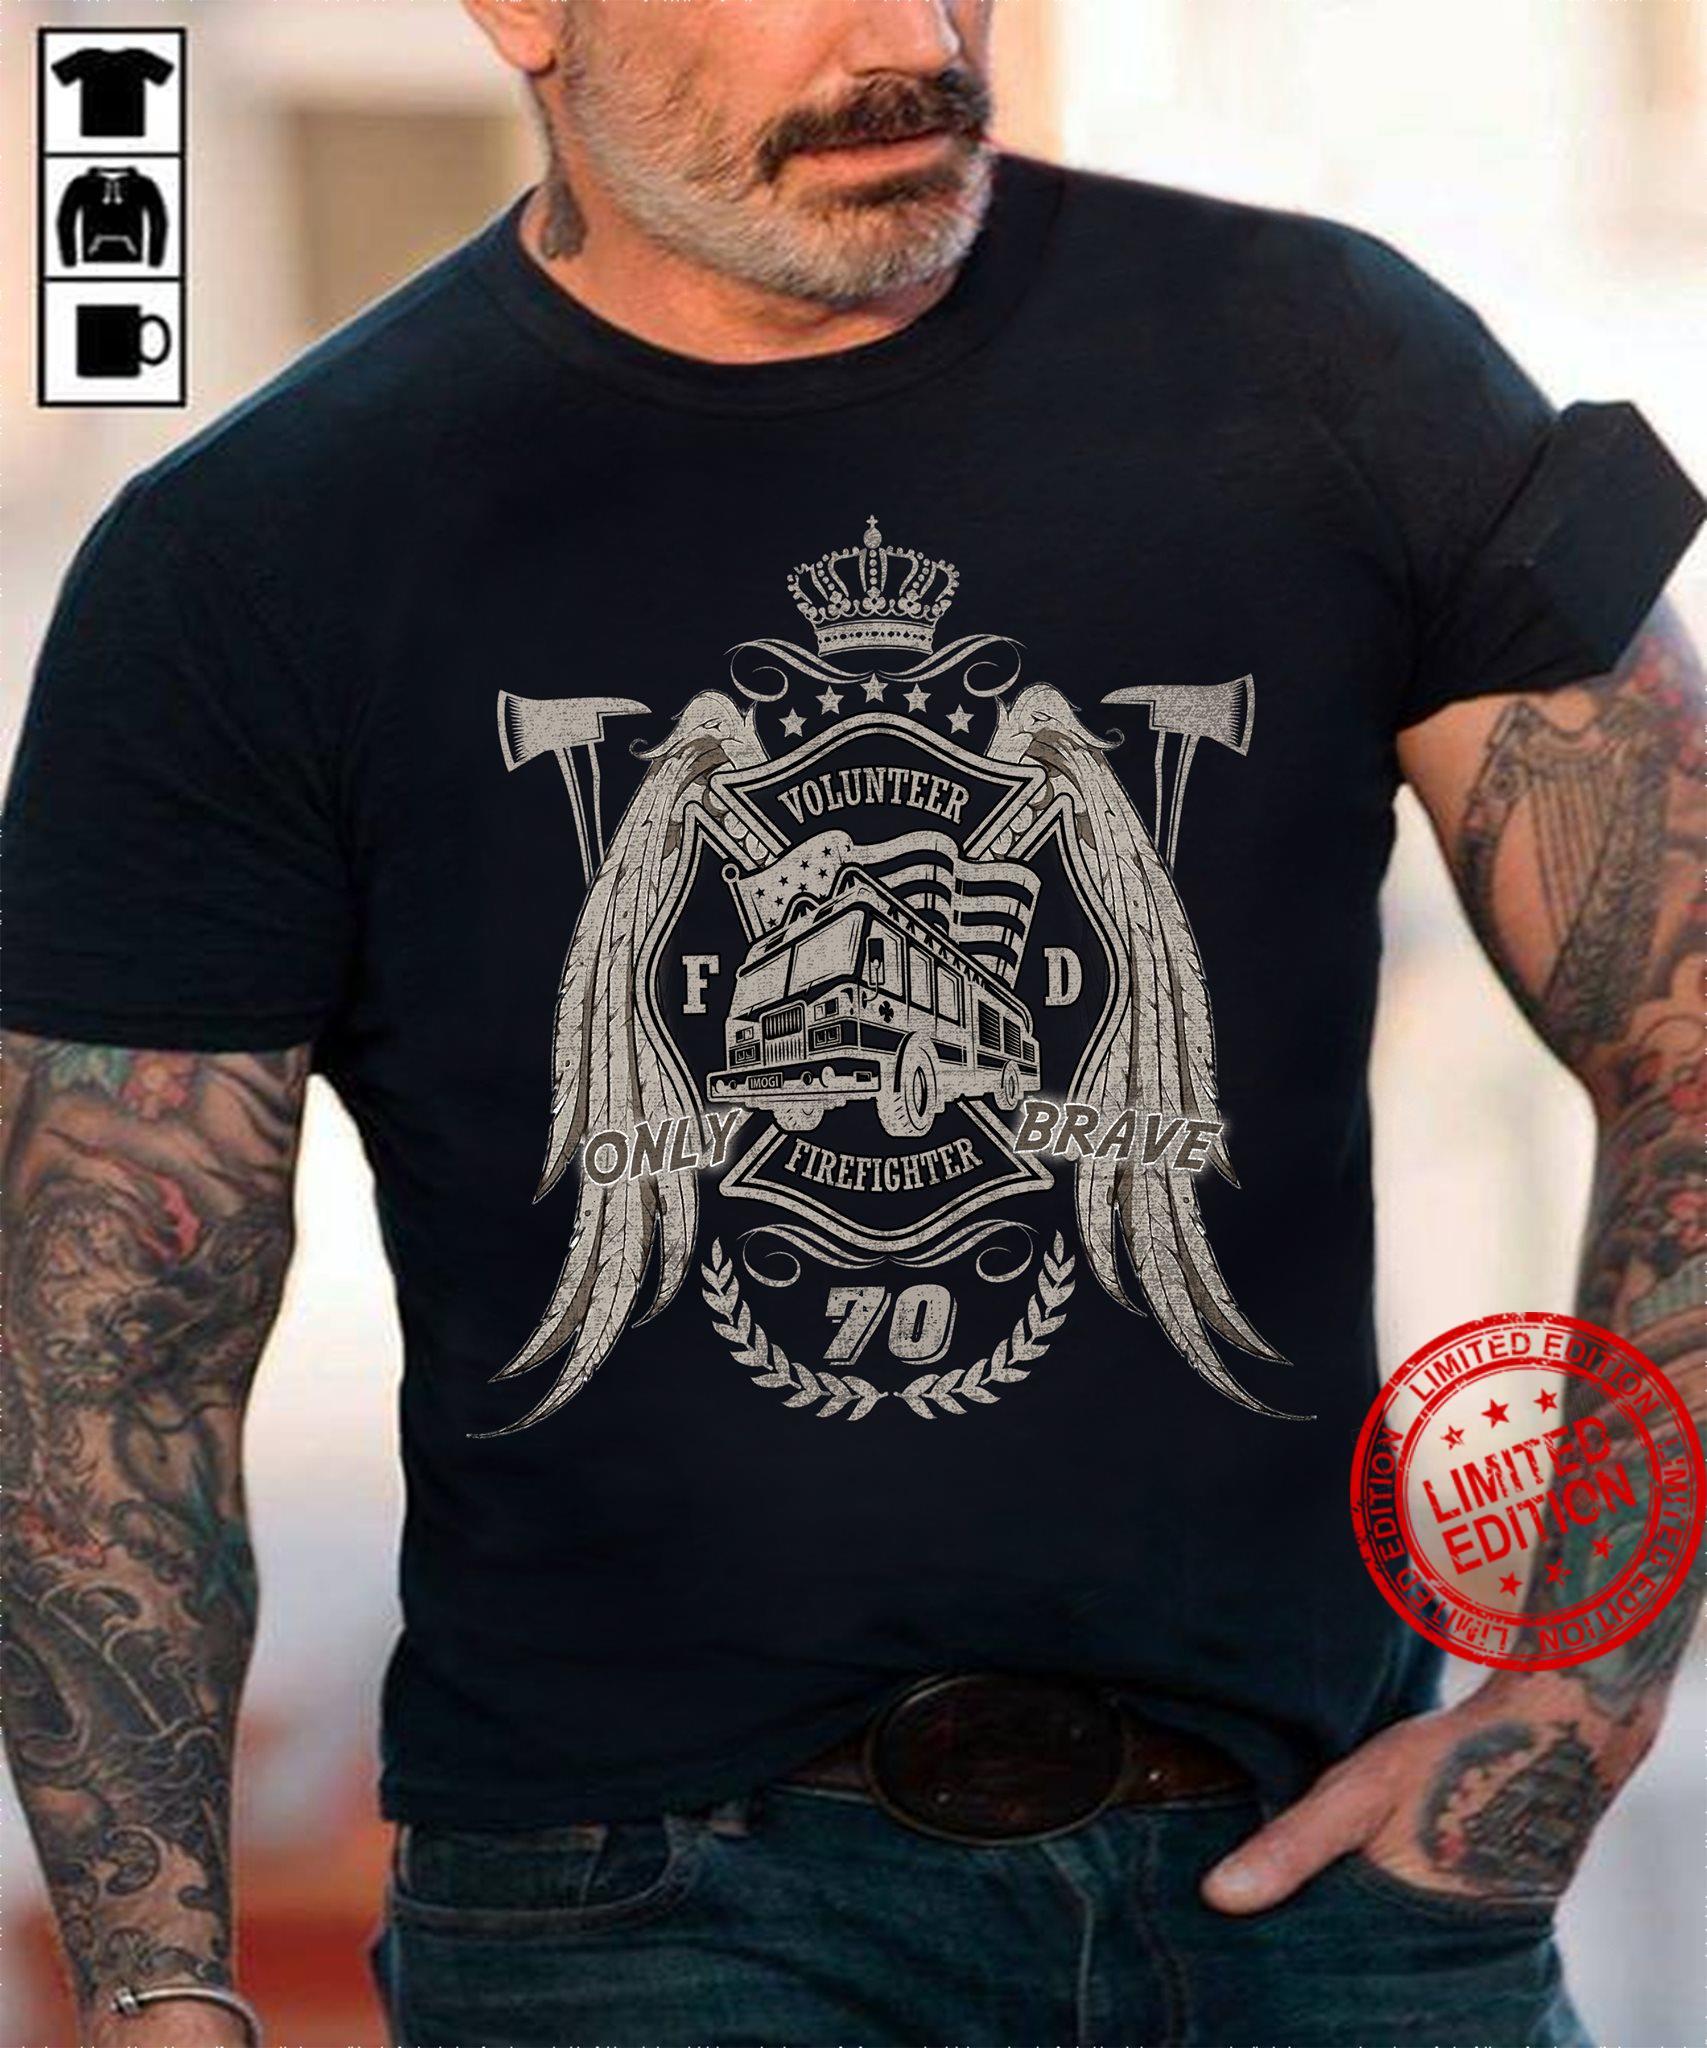 Volunteer Firefighter Only Brave 70 Shirt